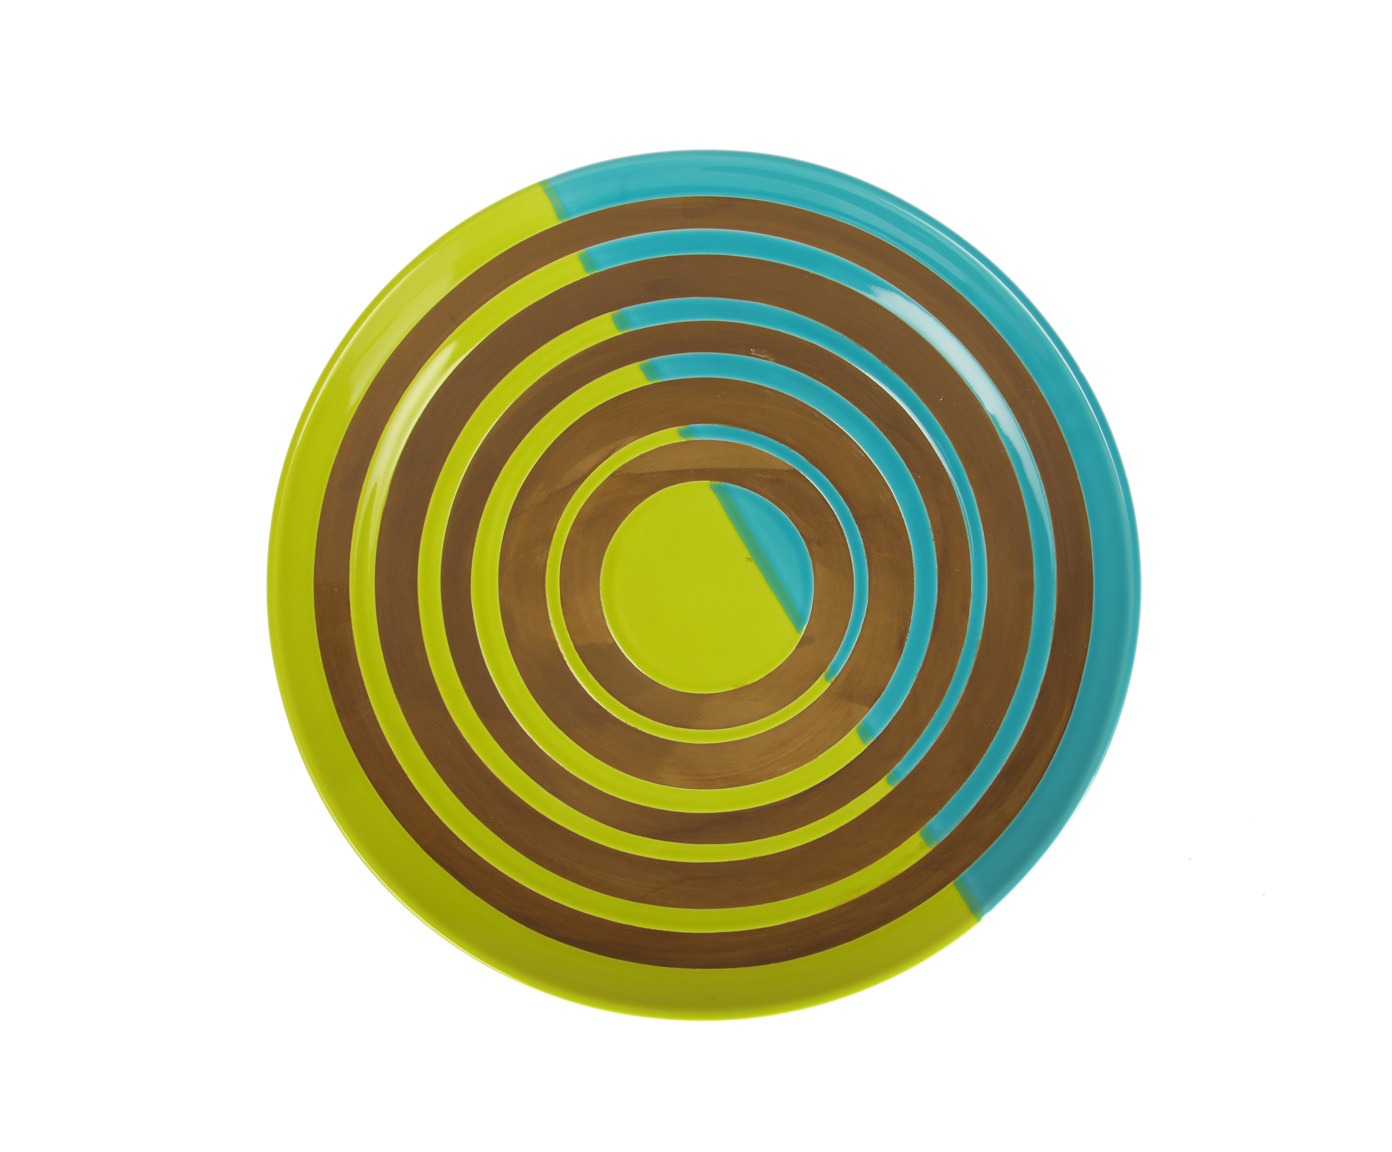 Блюда и тарелки Блюдо декоративное Marrocos от Sporvil blyudo-dekorativnoe-marrocos-ot-sporvil-iz-portugalii.jpg